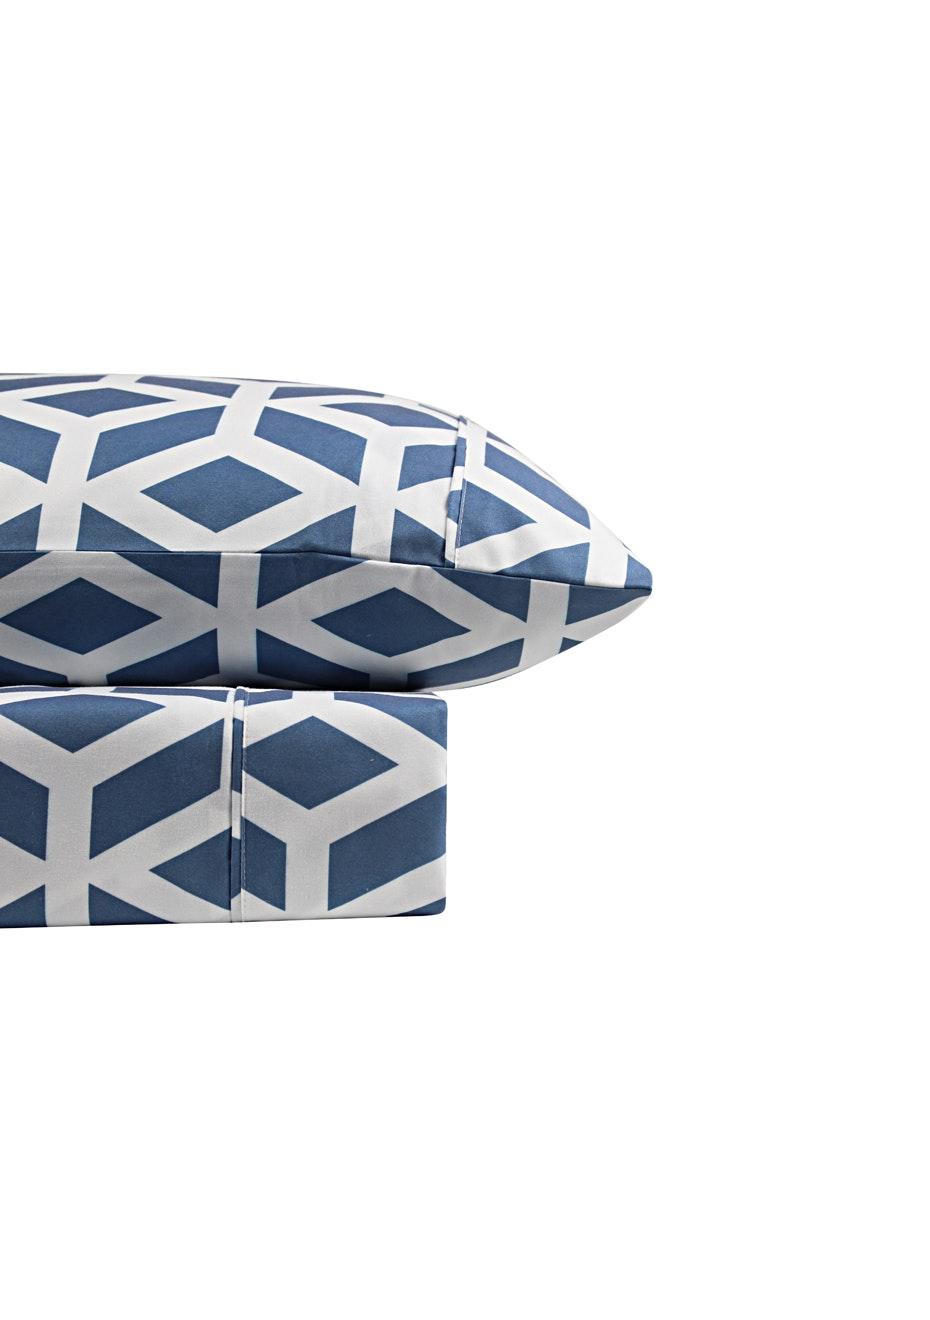 Thermal Flannel Sheet Sets - Manhattan Design - Bay Blue - Single Bed